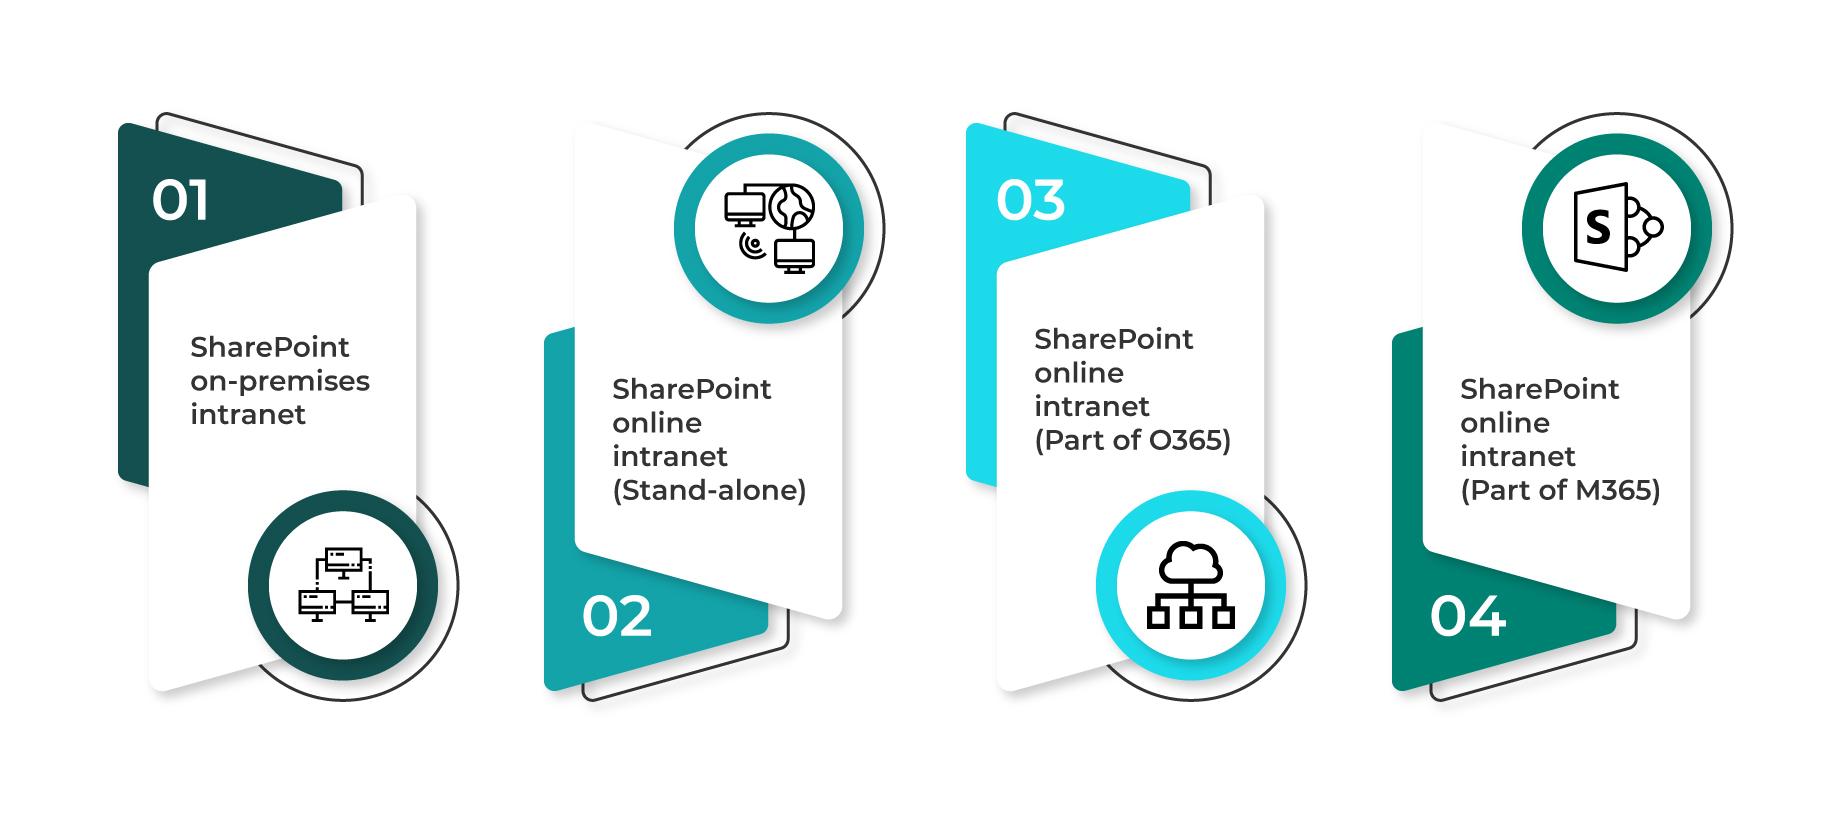 SharePoint Intranet